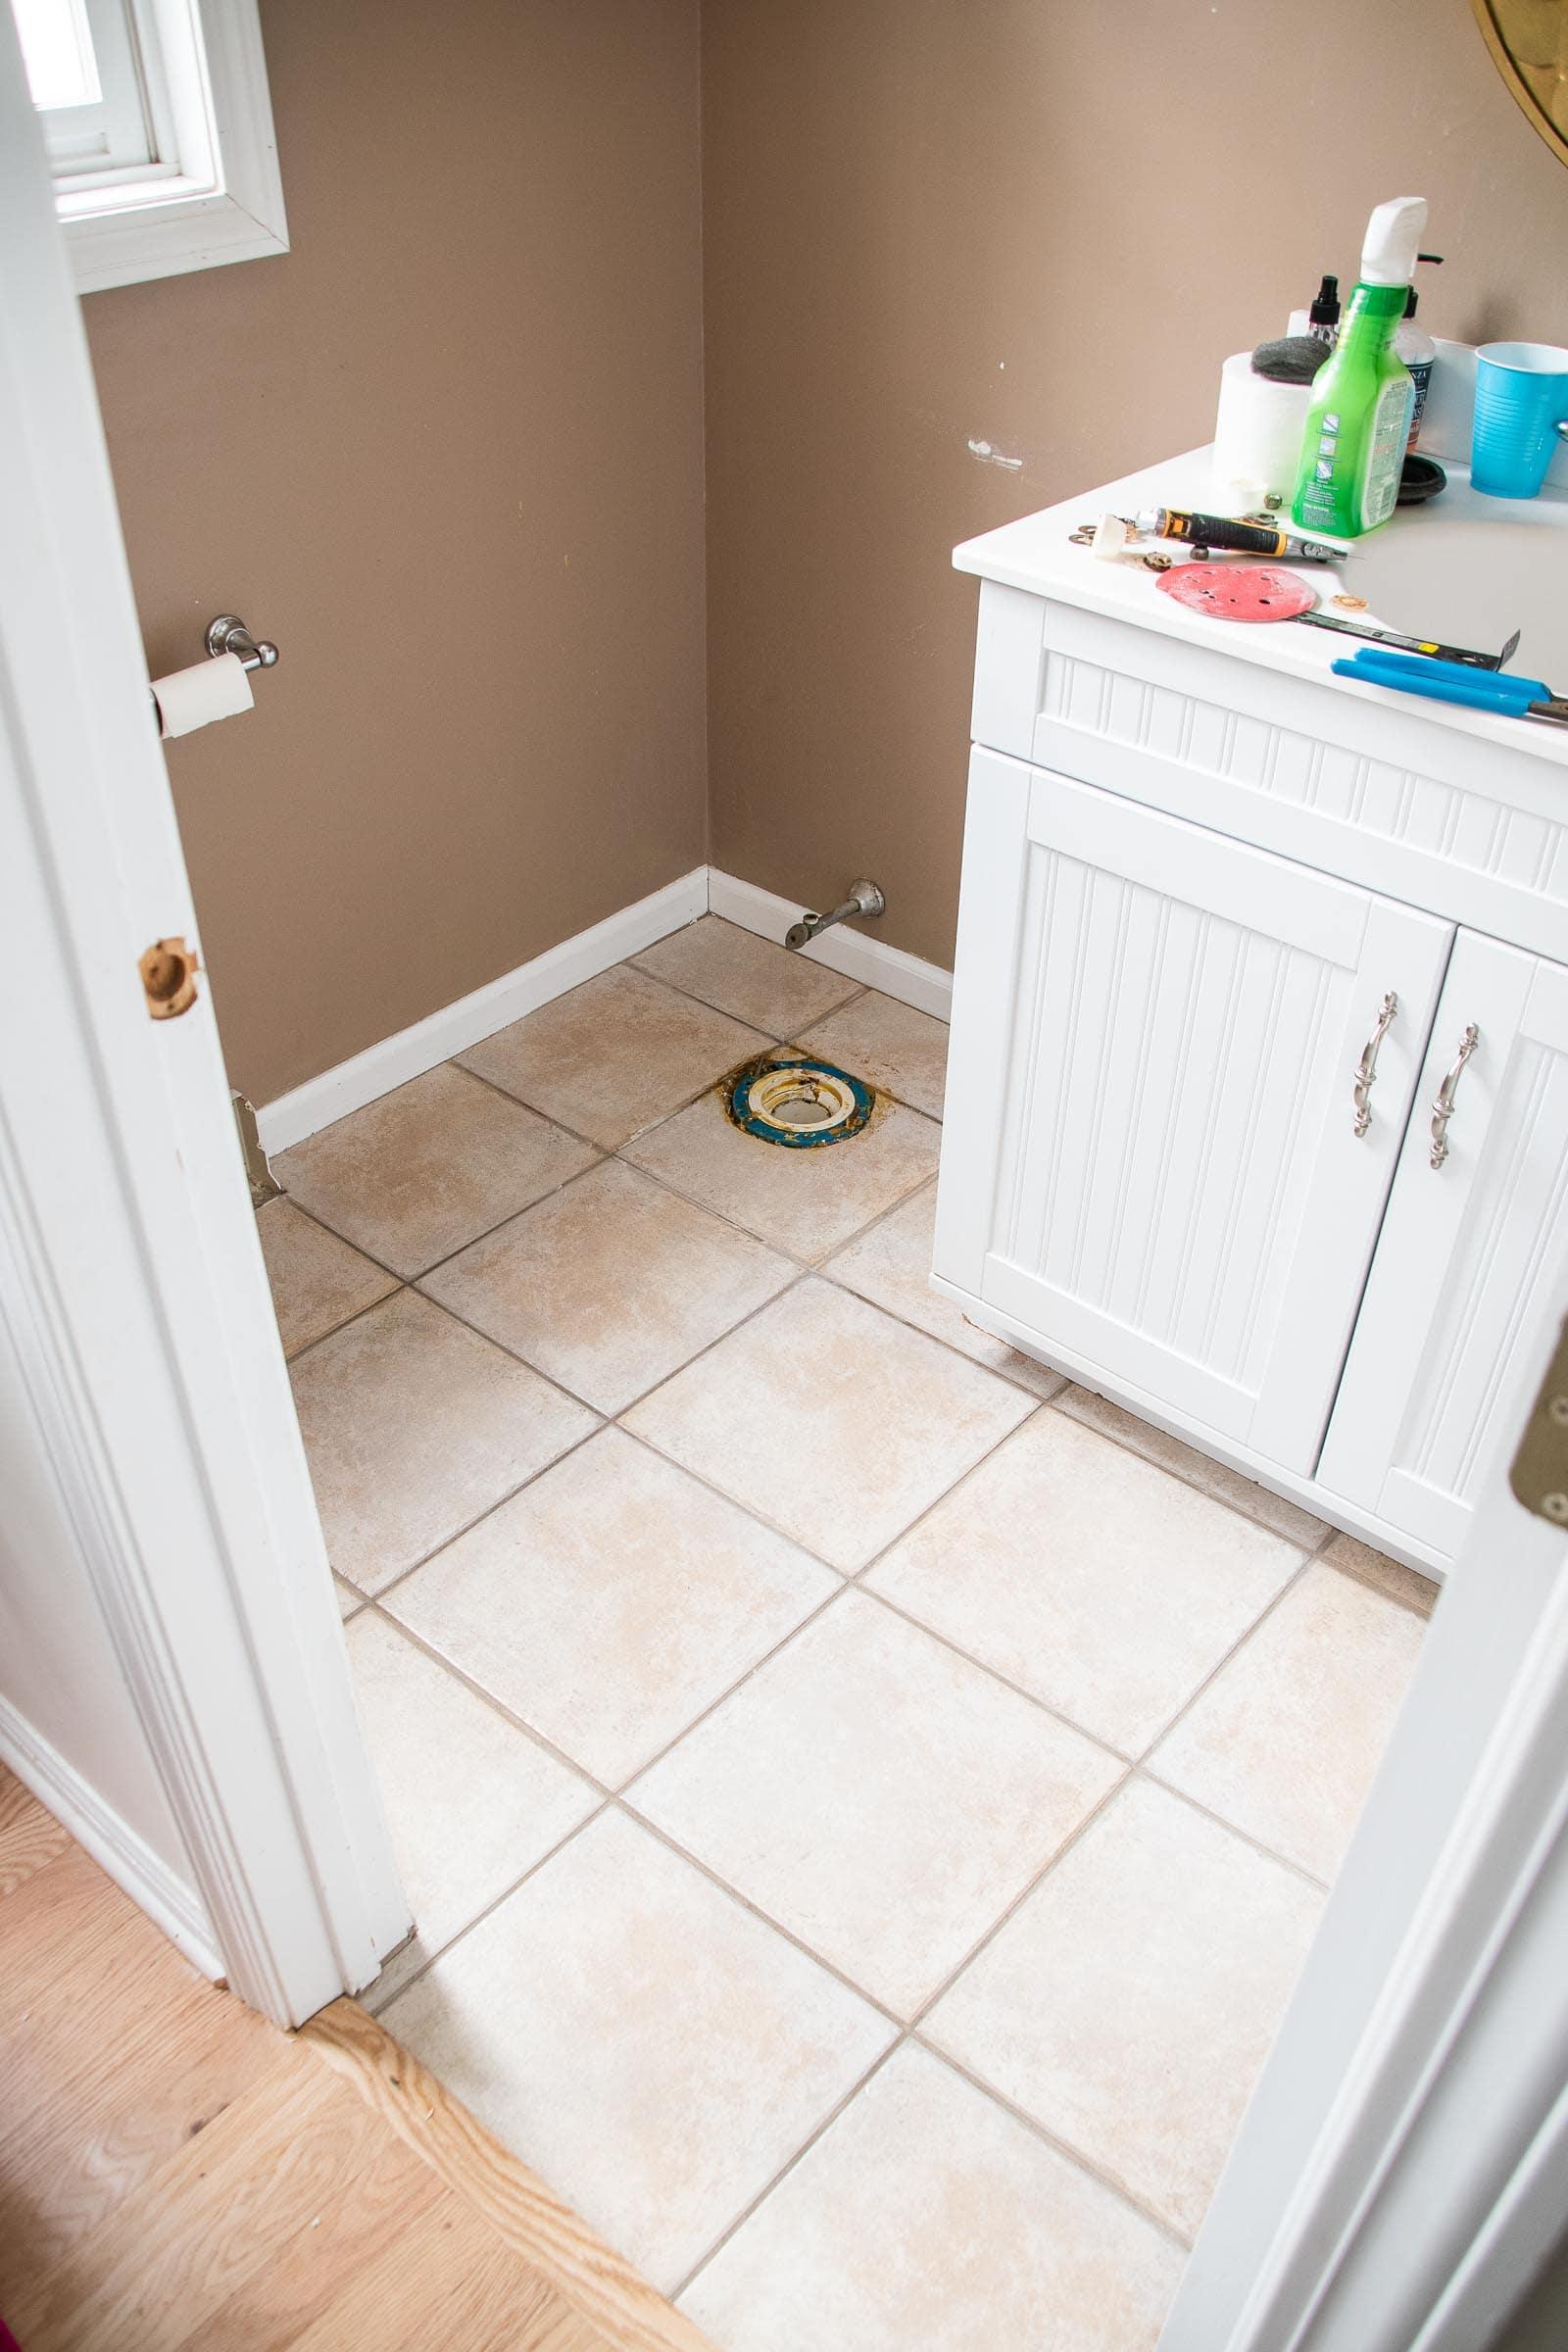 applying self adhesive vinyl tiles to